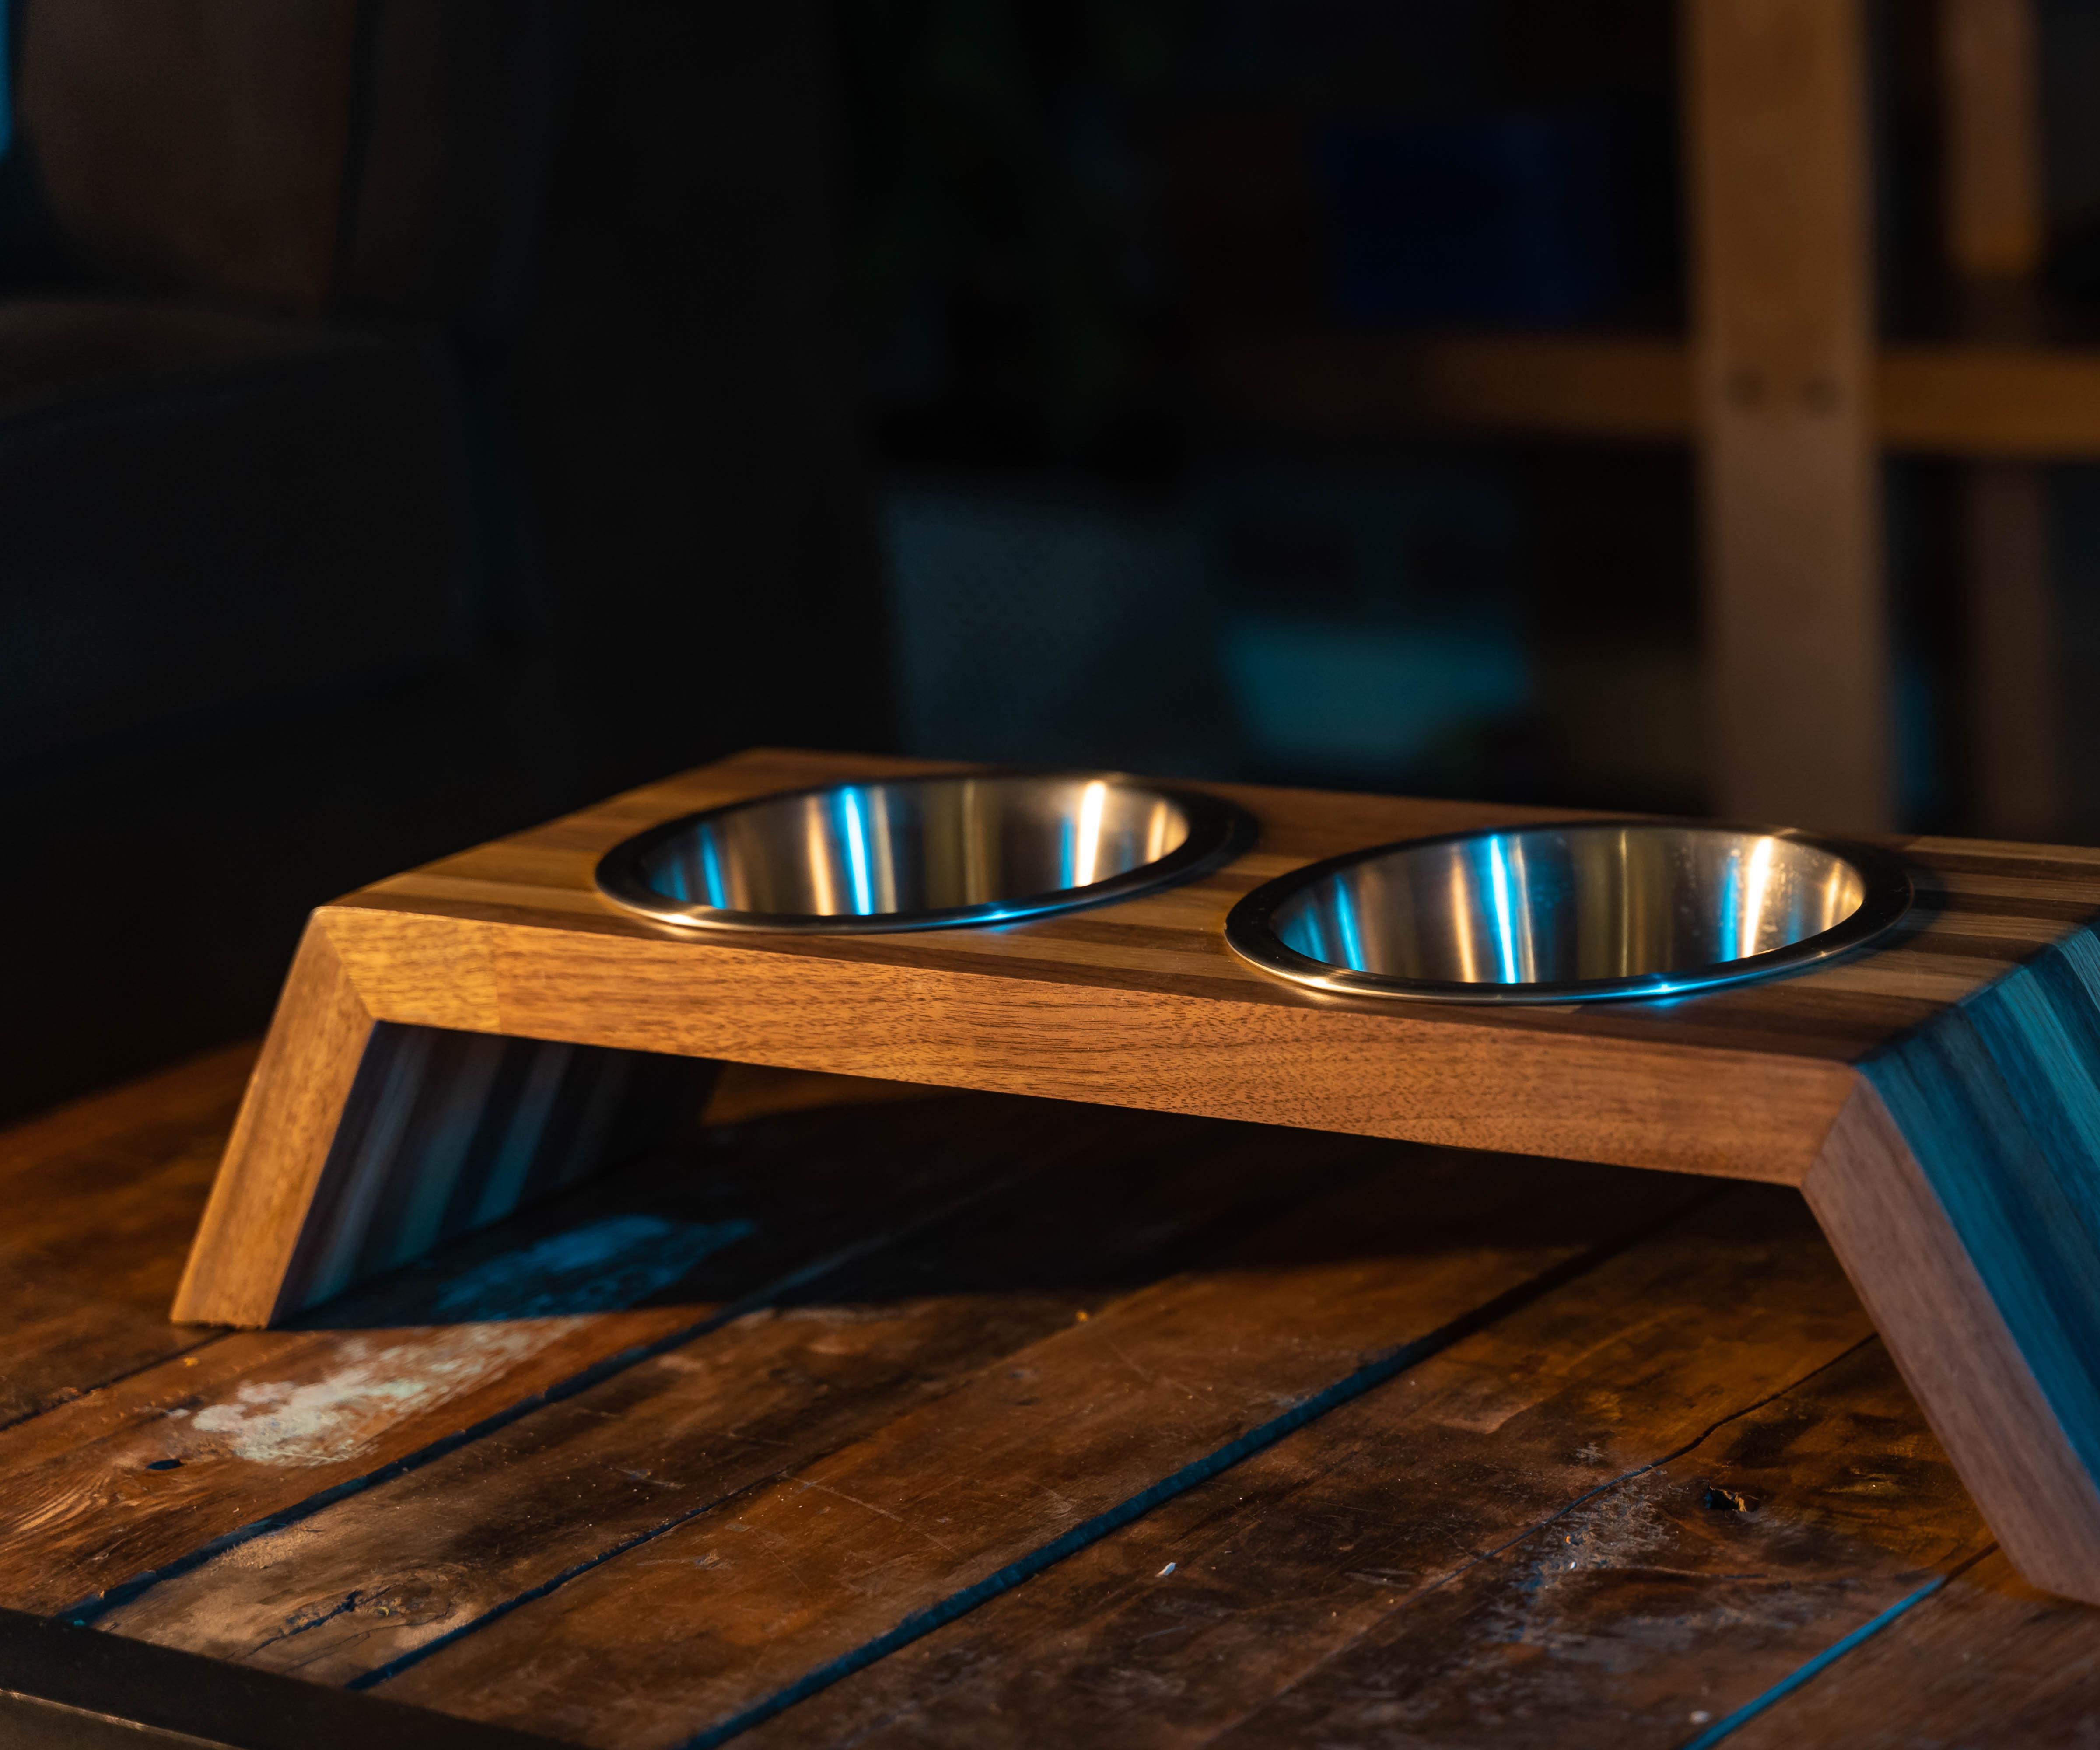 Bing's Dish Holder